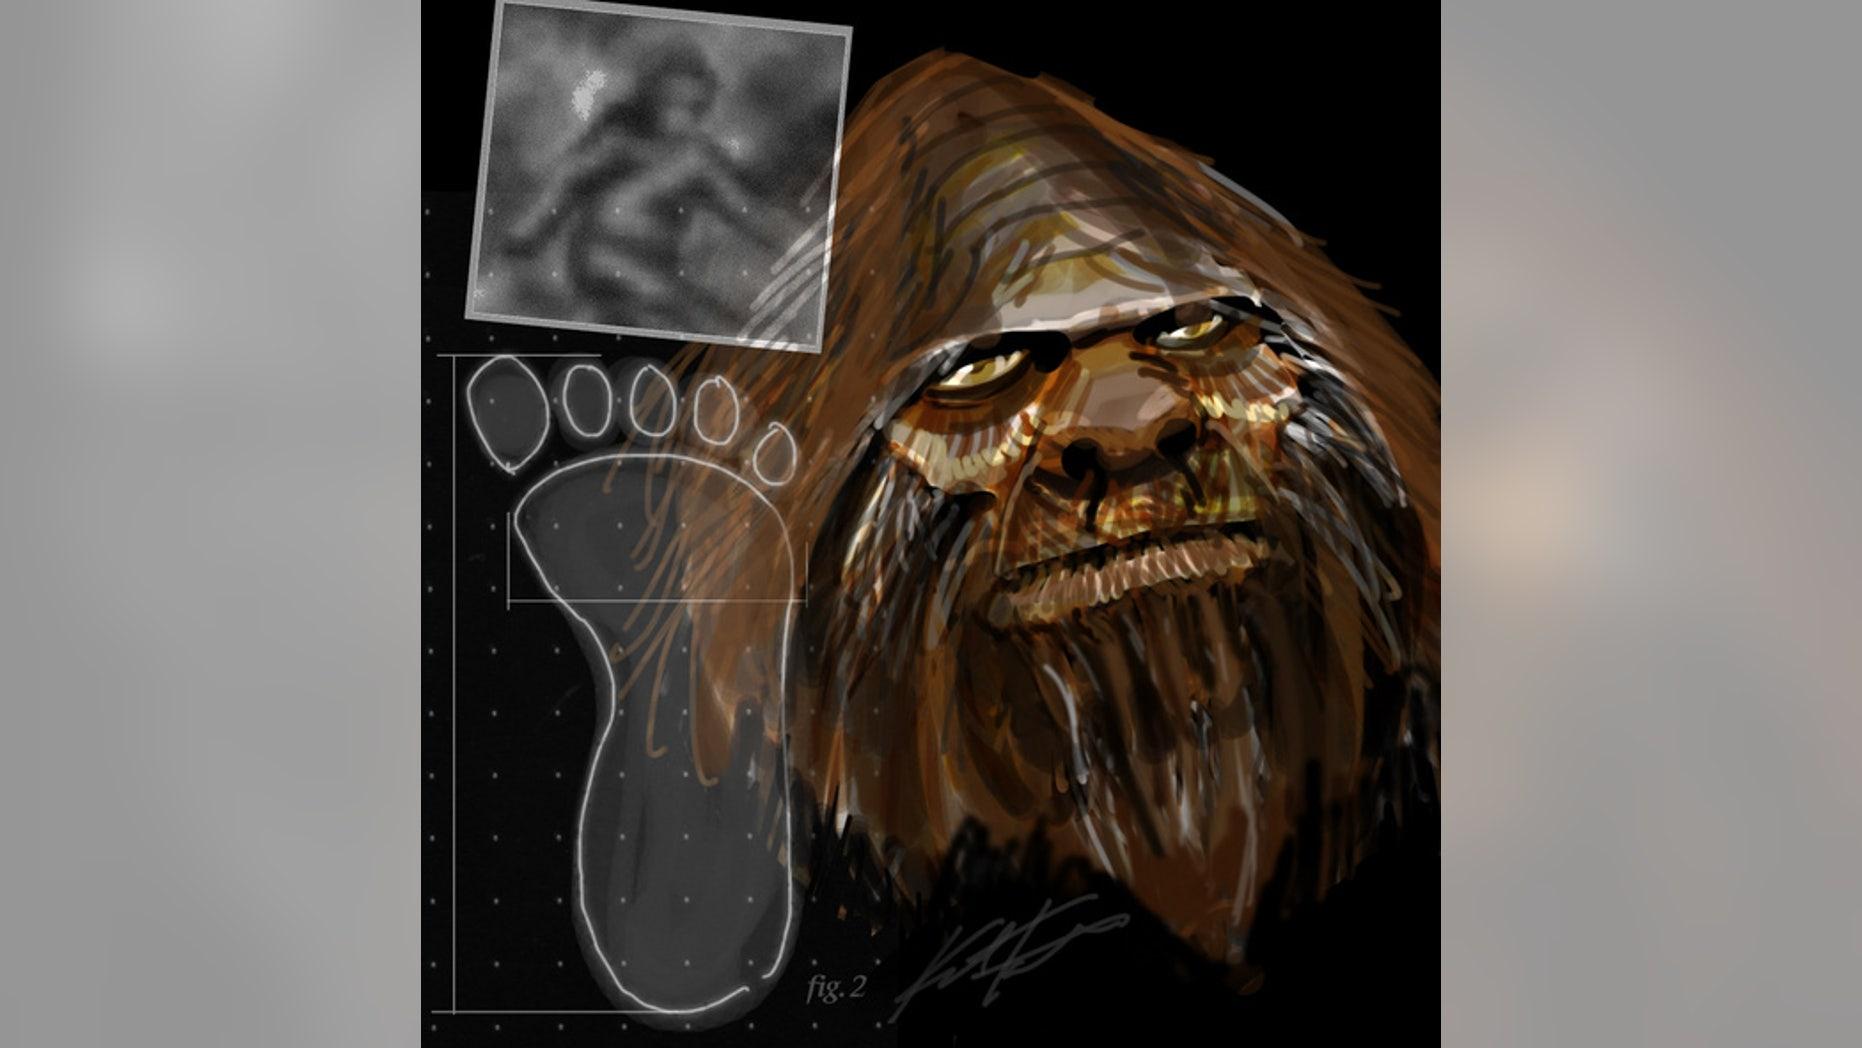 An artist's interpretation of Bigfoot.